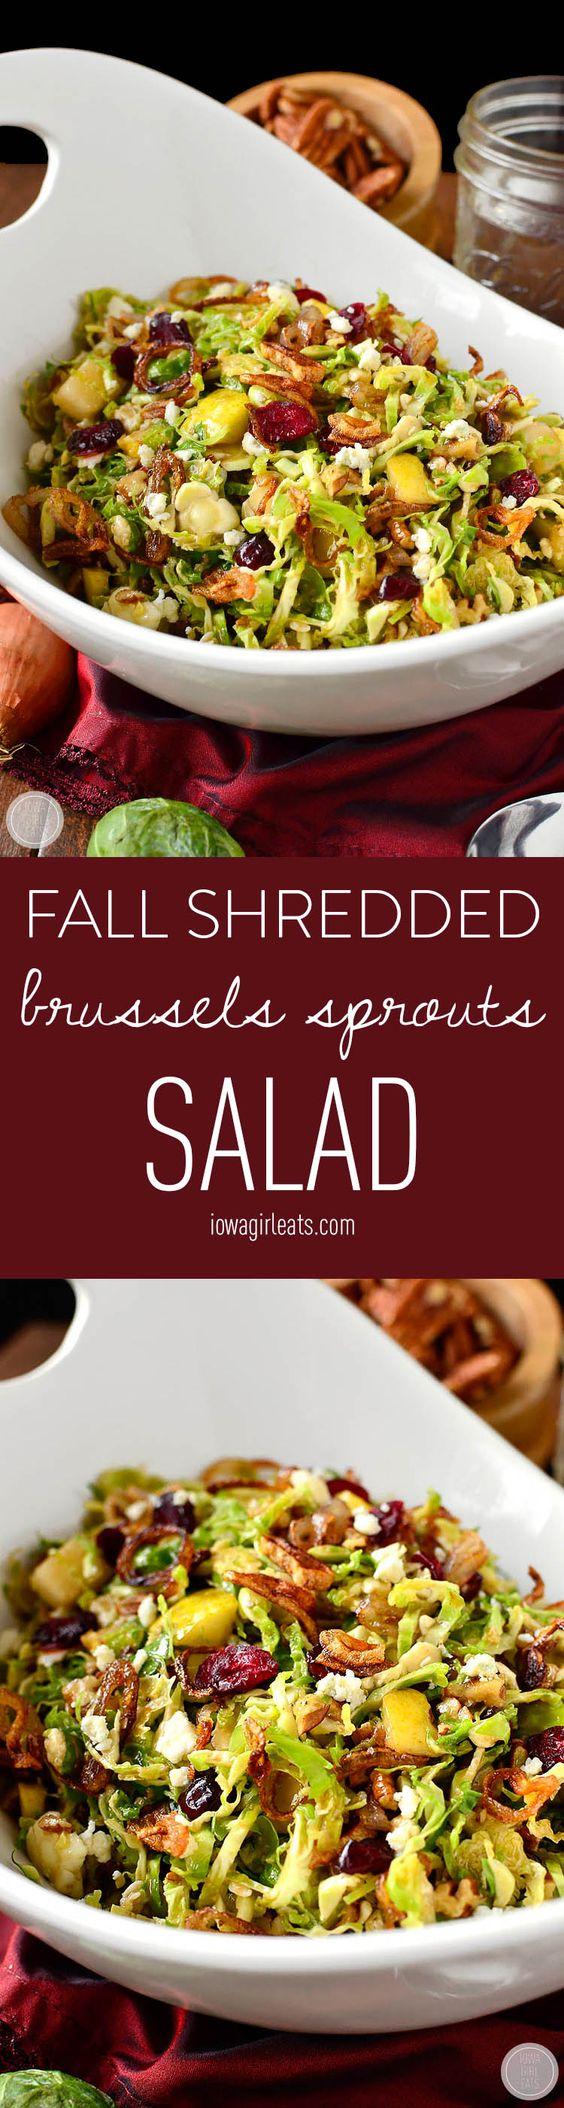 1000+ ideas about Thanksgiving Salad on Pinterest | Salad ...